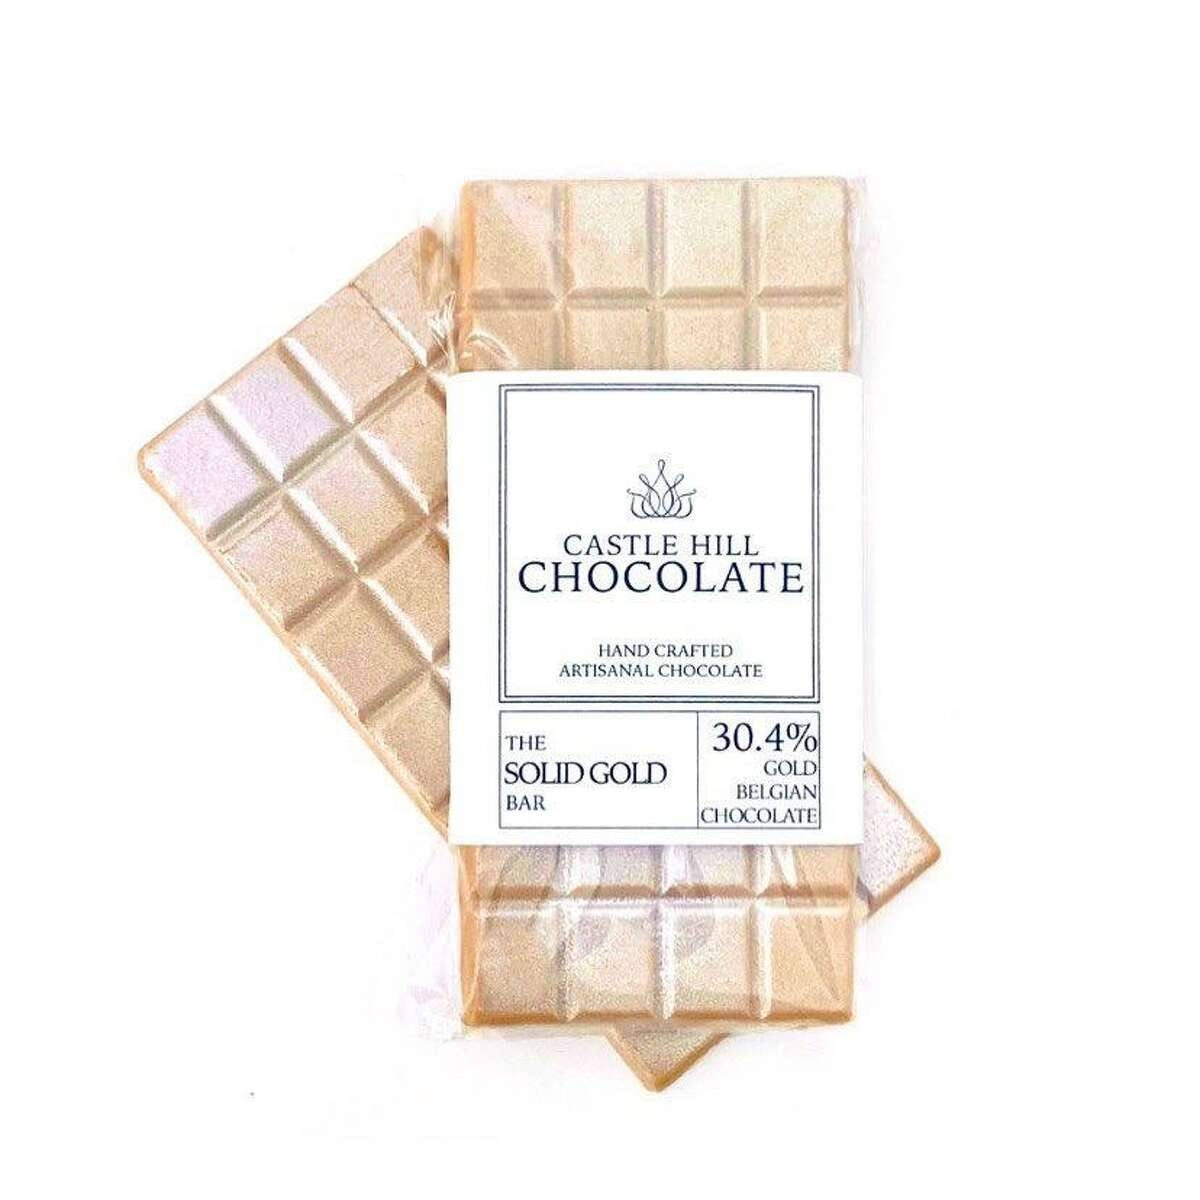 Castle Hill Chocolate in Newtown offers seasonal artisanal chocolates.